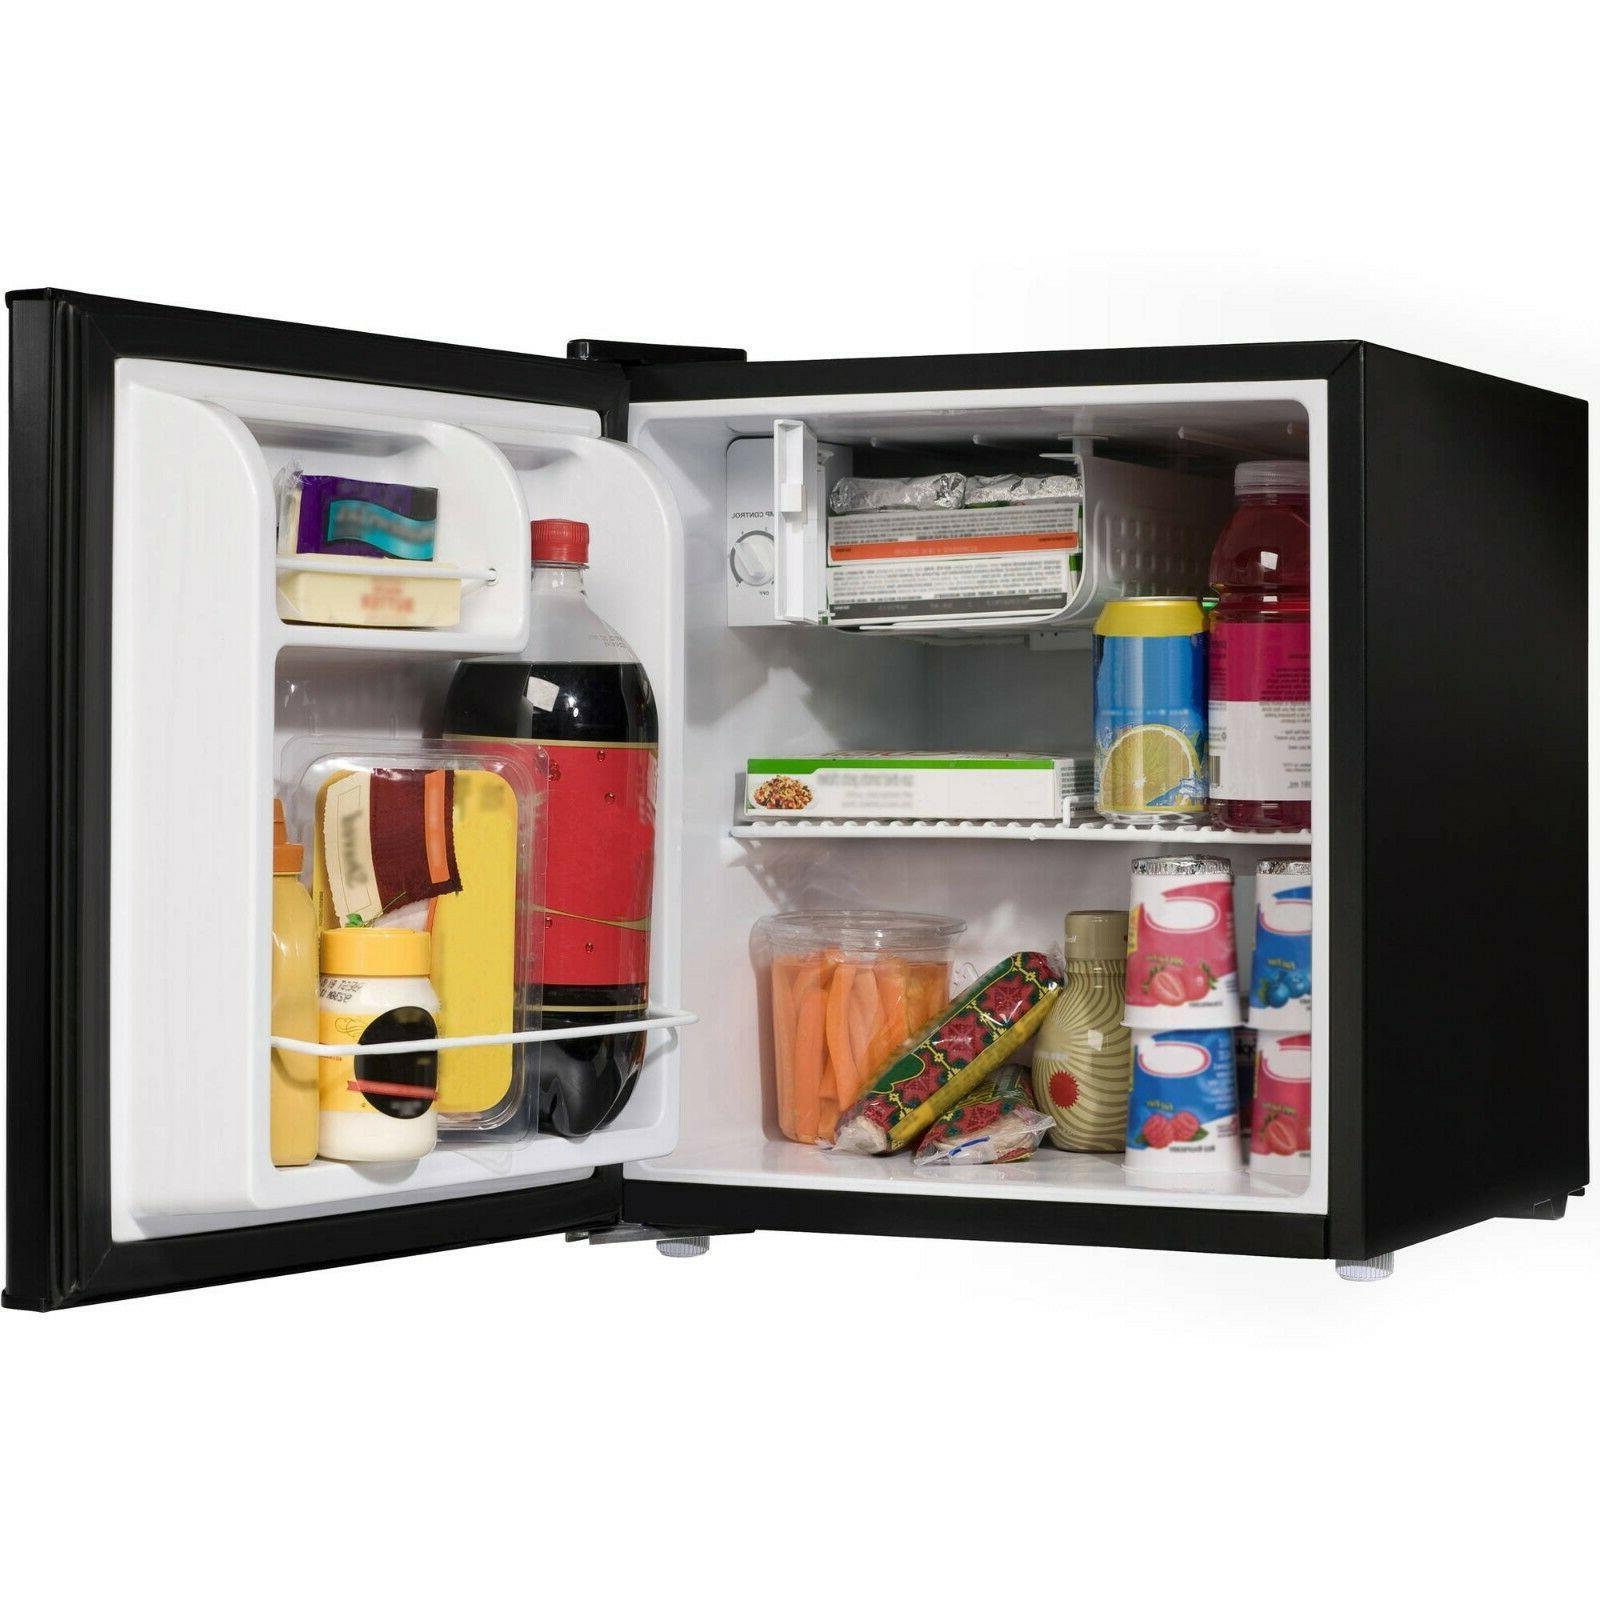 Compact Mini Fridge Refrigerator 1.7 Cu Ft Office Dorm Small